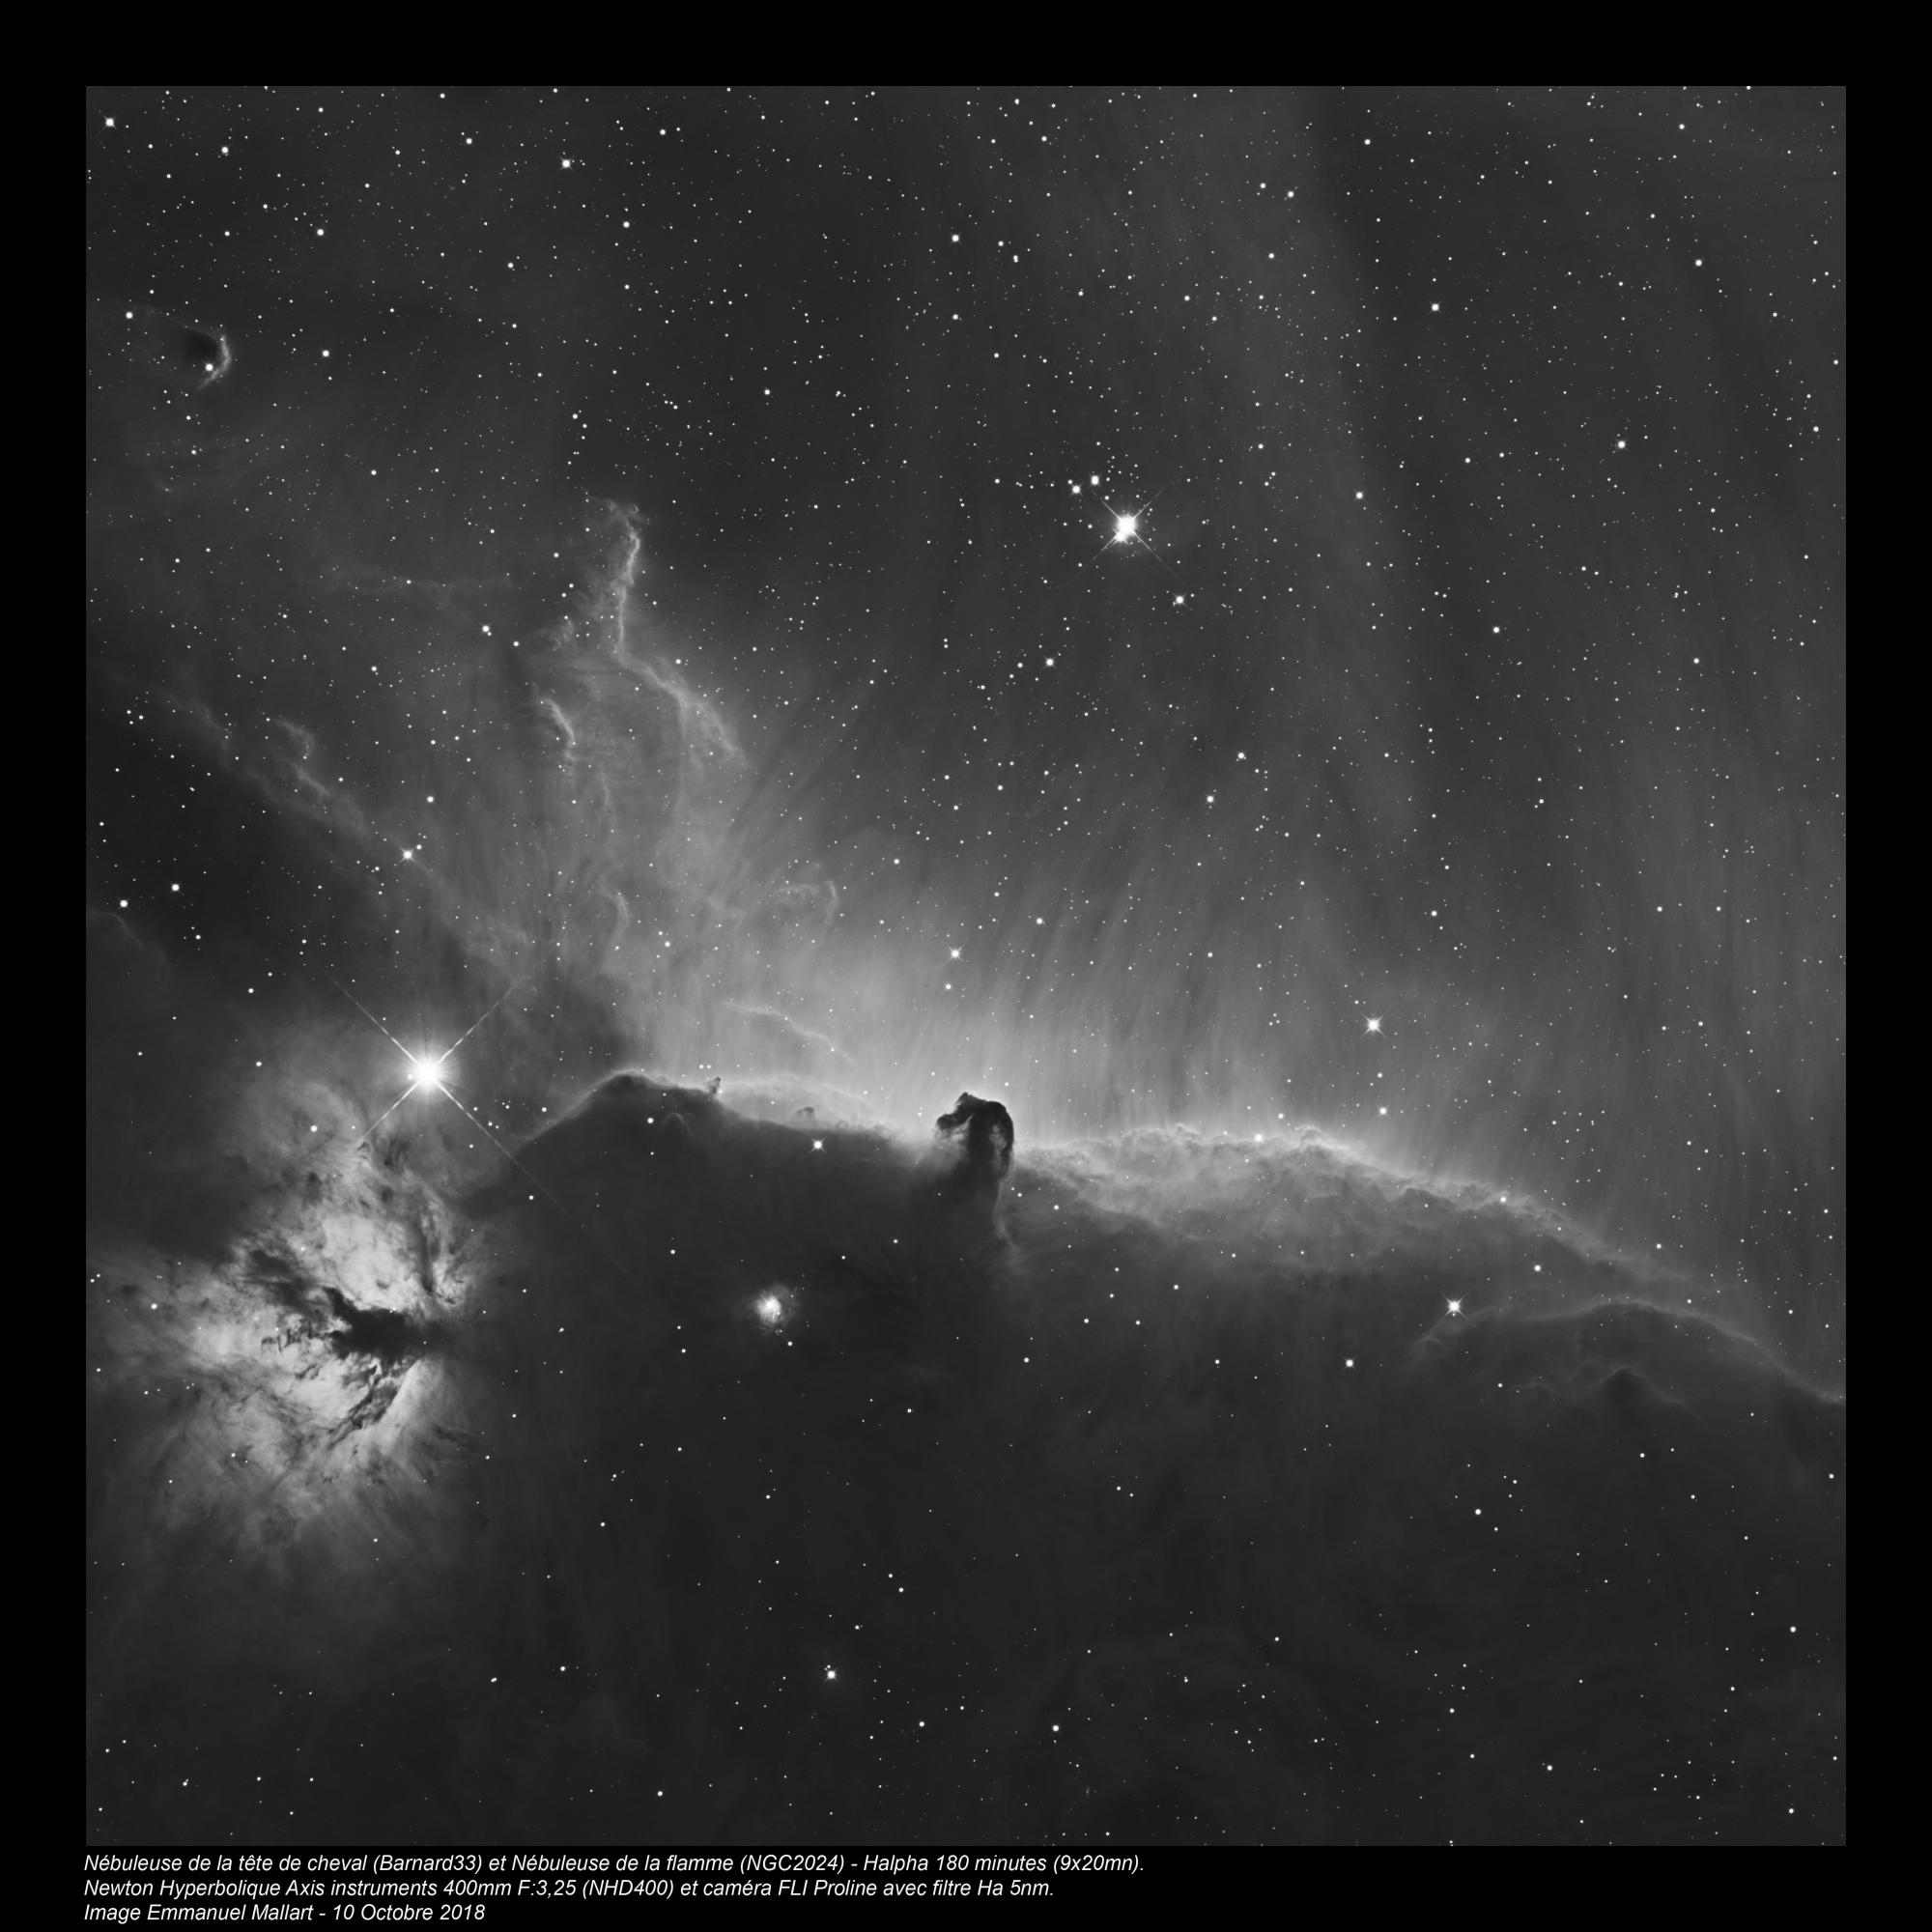 Barnard33&NGC2024_Ha_181010.jpg